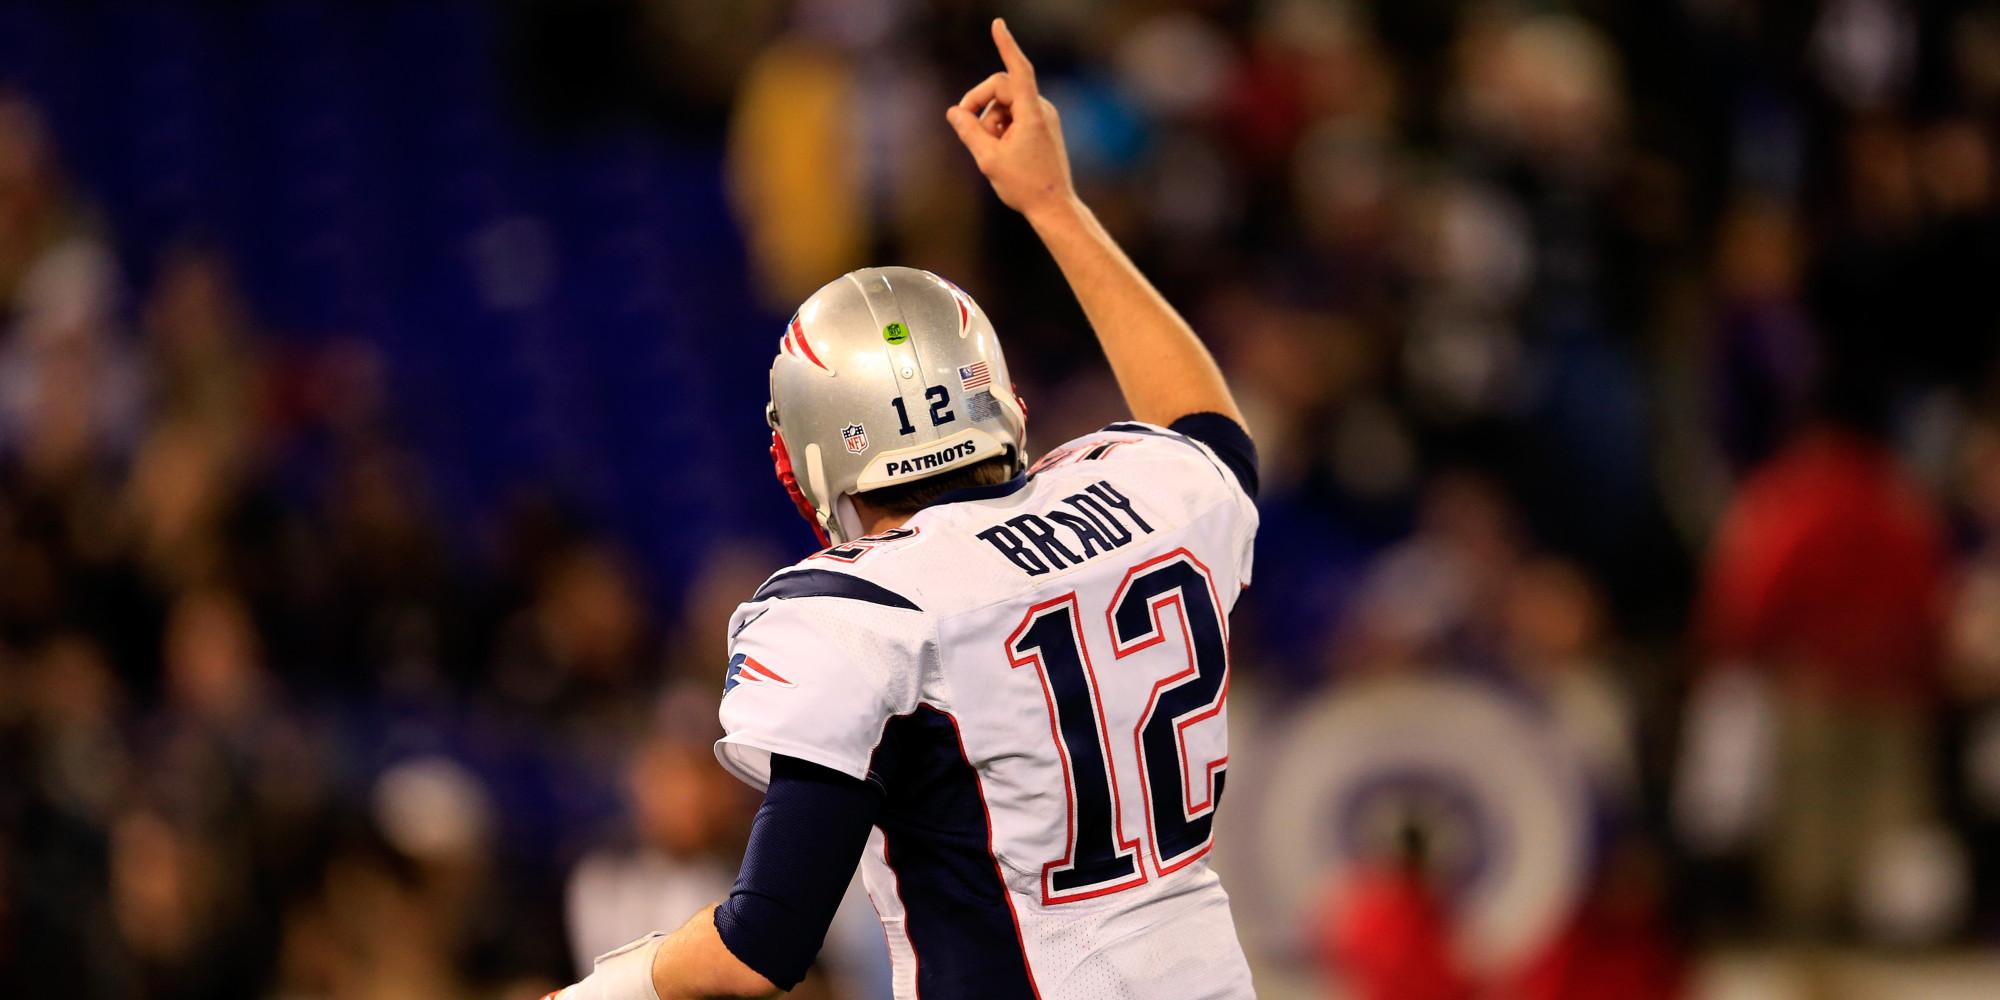 Brady comes up big once again. History is made! (Via theodesseyonline.com)